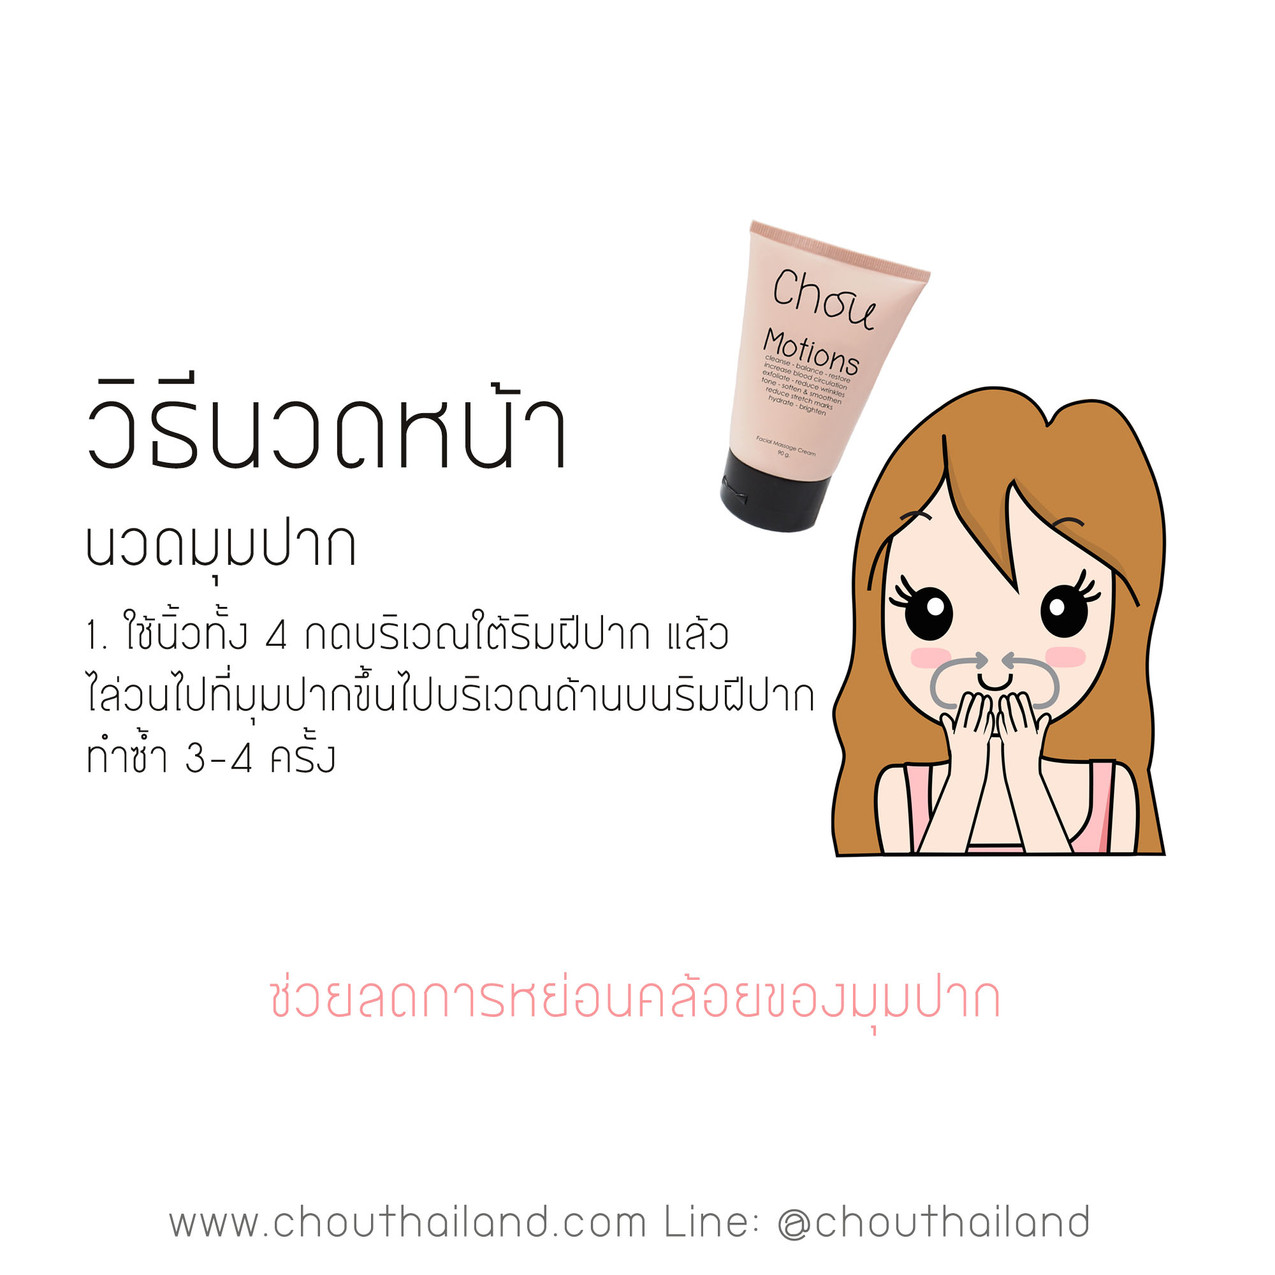 Motions Massage cream 4 Mouth massage